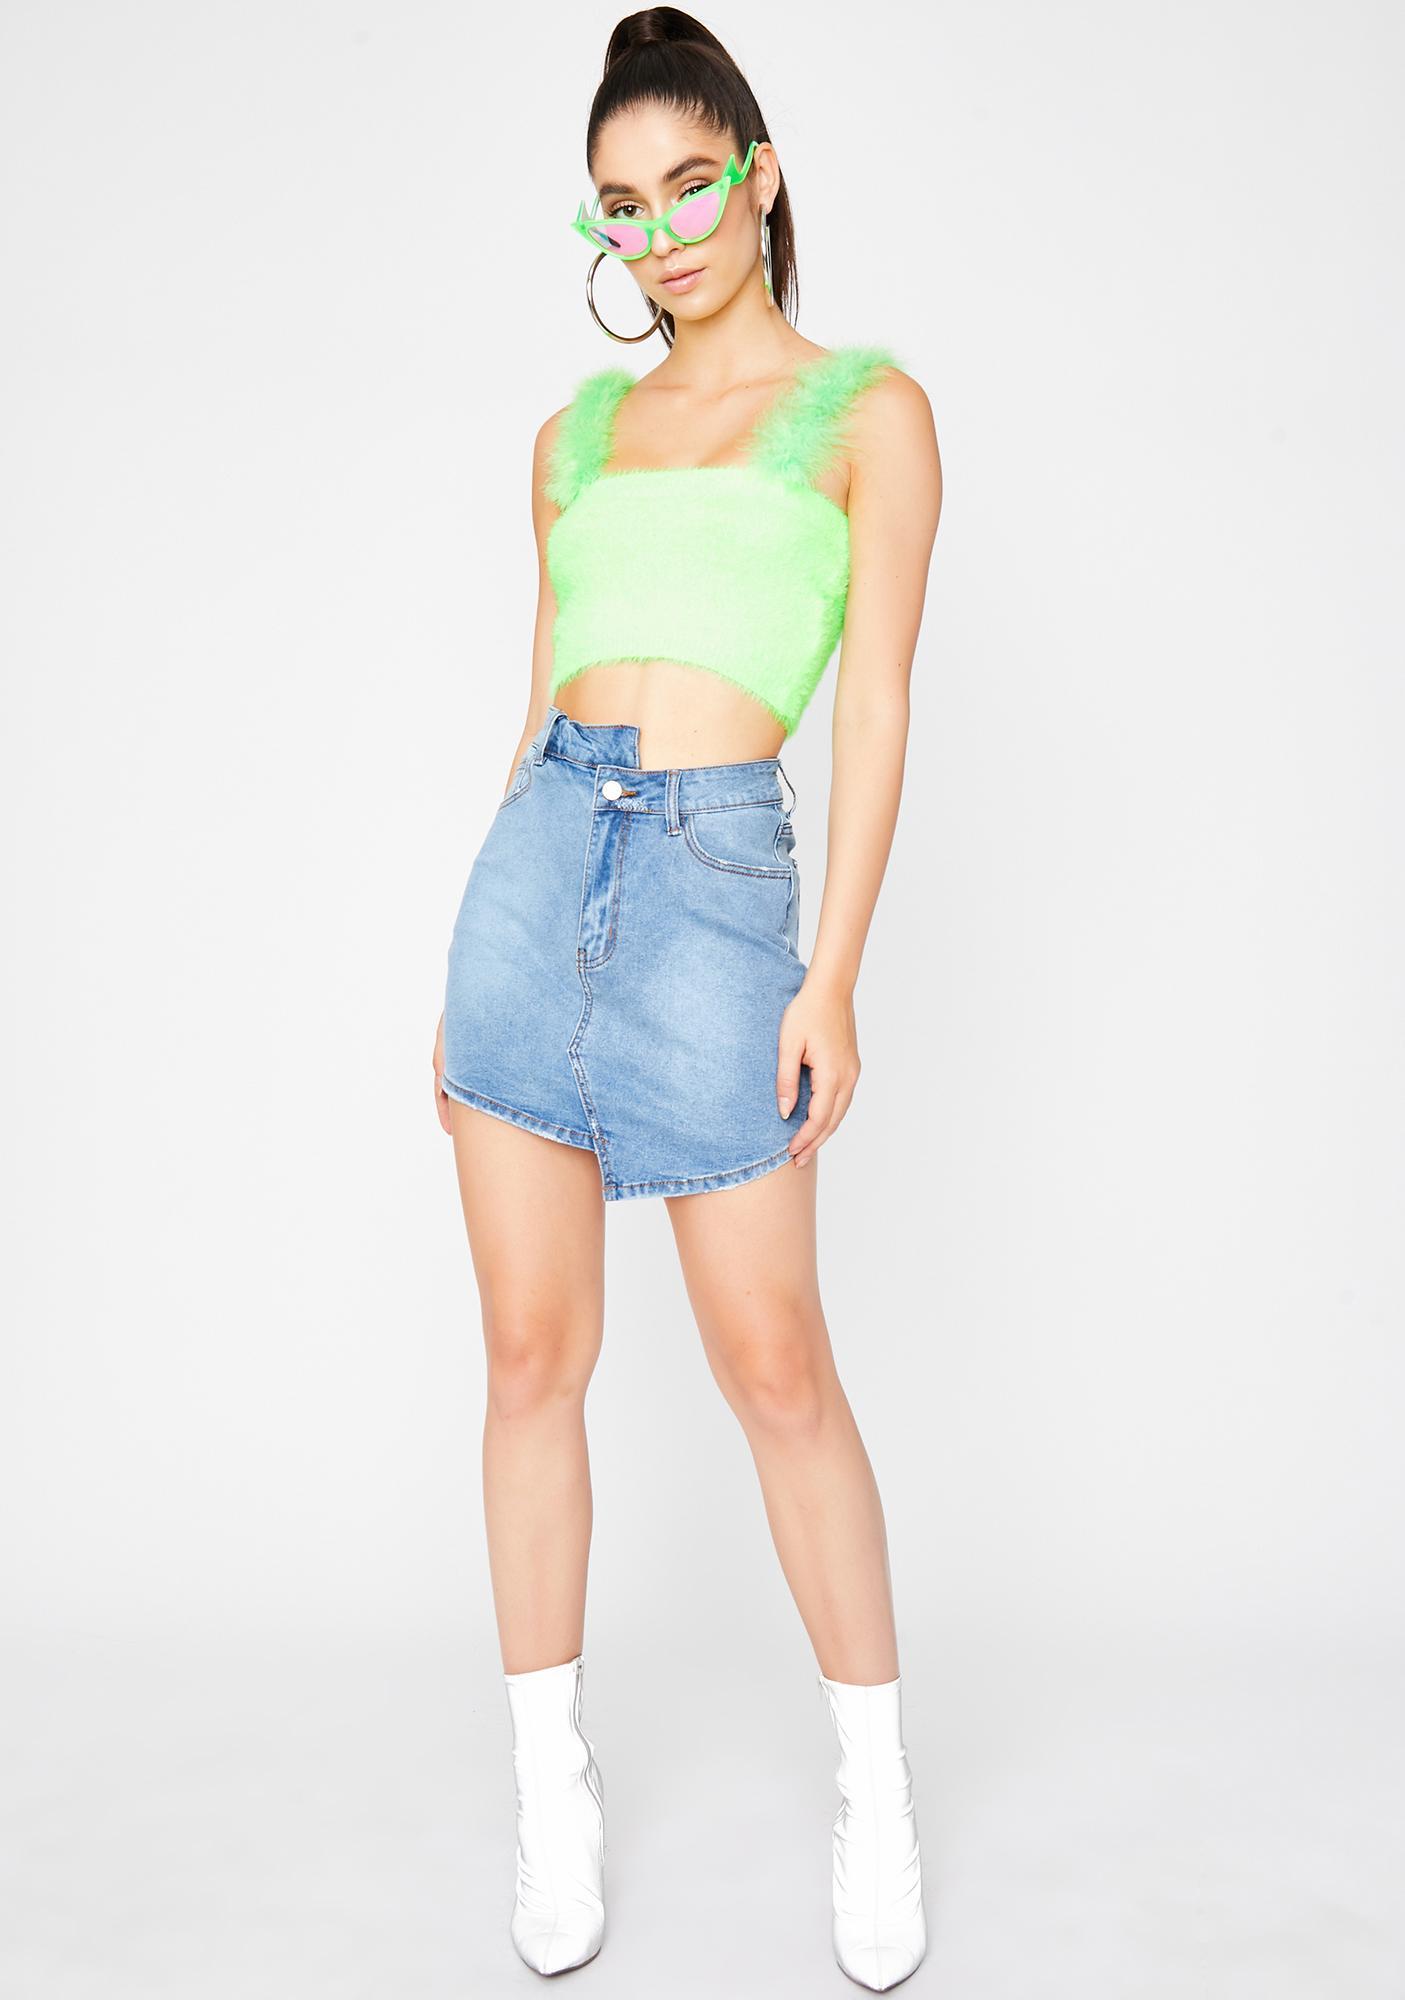 Lime Warm N' Fuzzy Crop Top